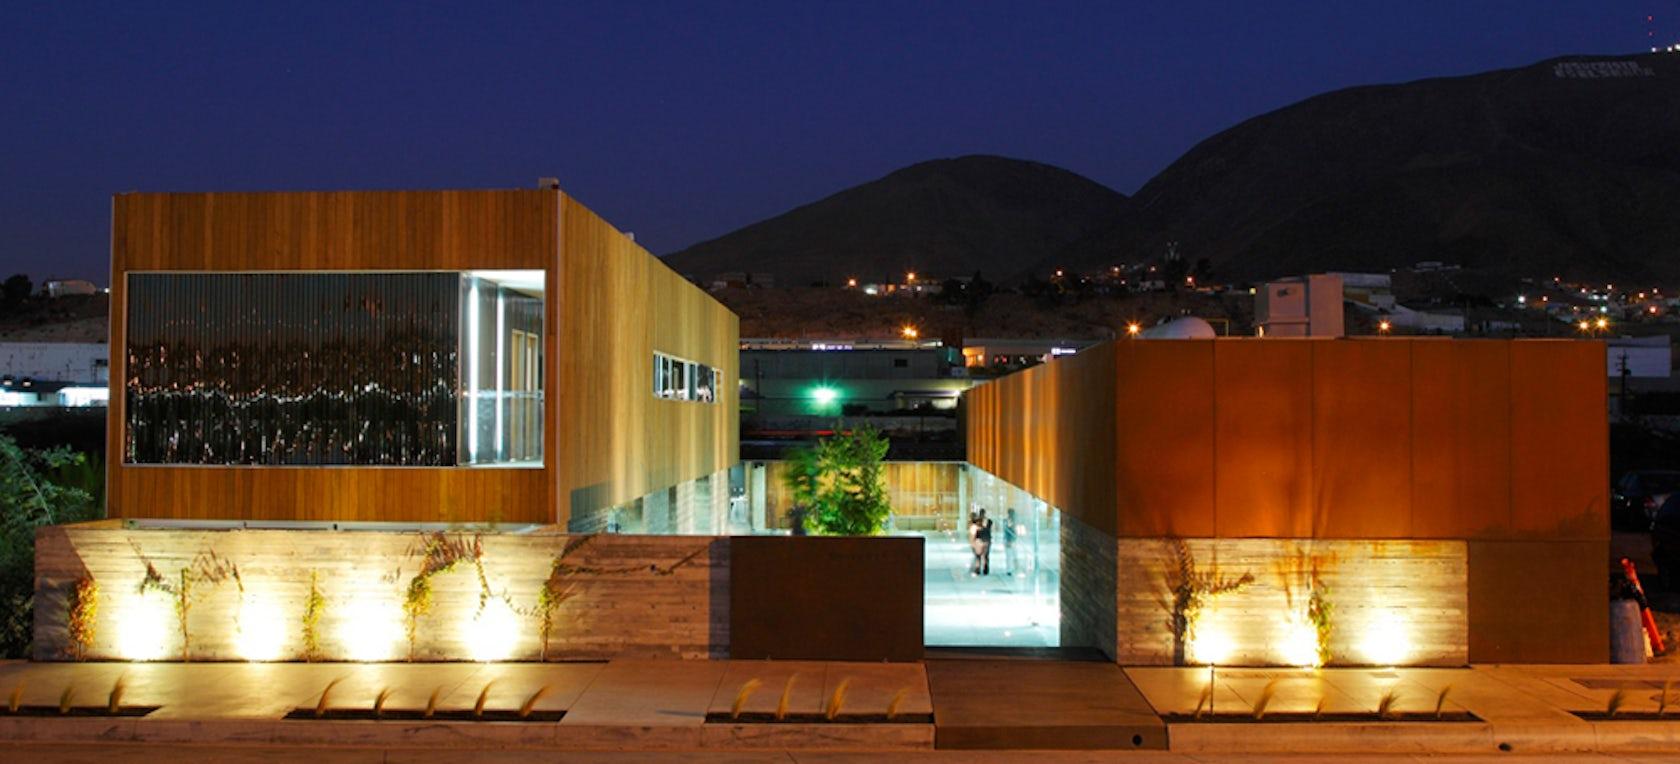 culinary art school architizer. Black Bedroom Furniture Sets. Home Design Ideas